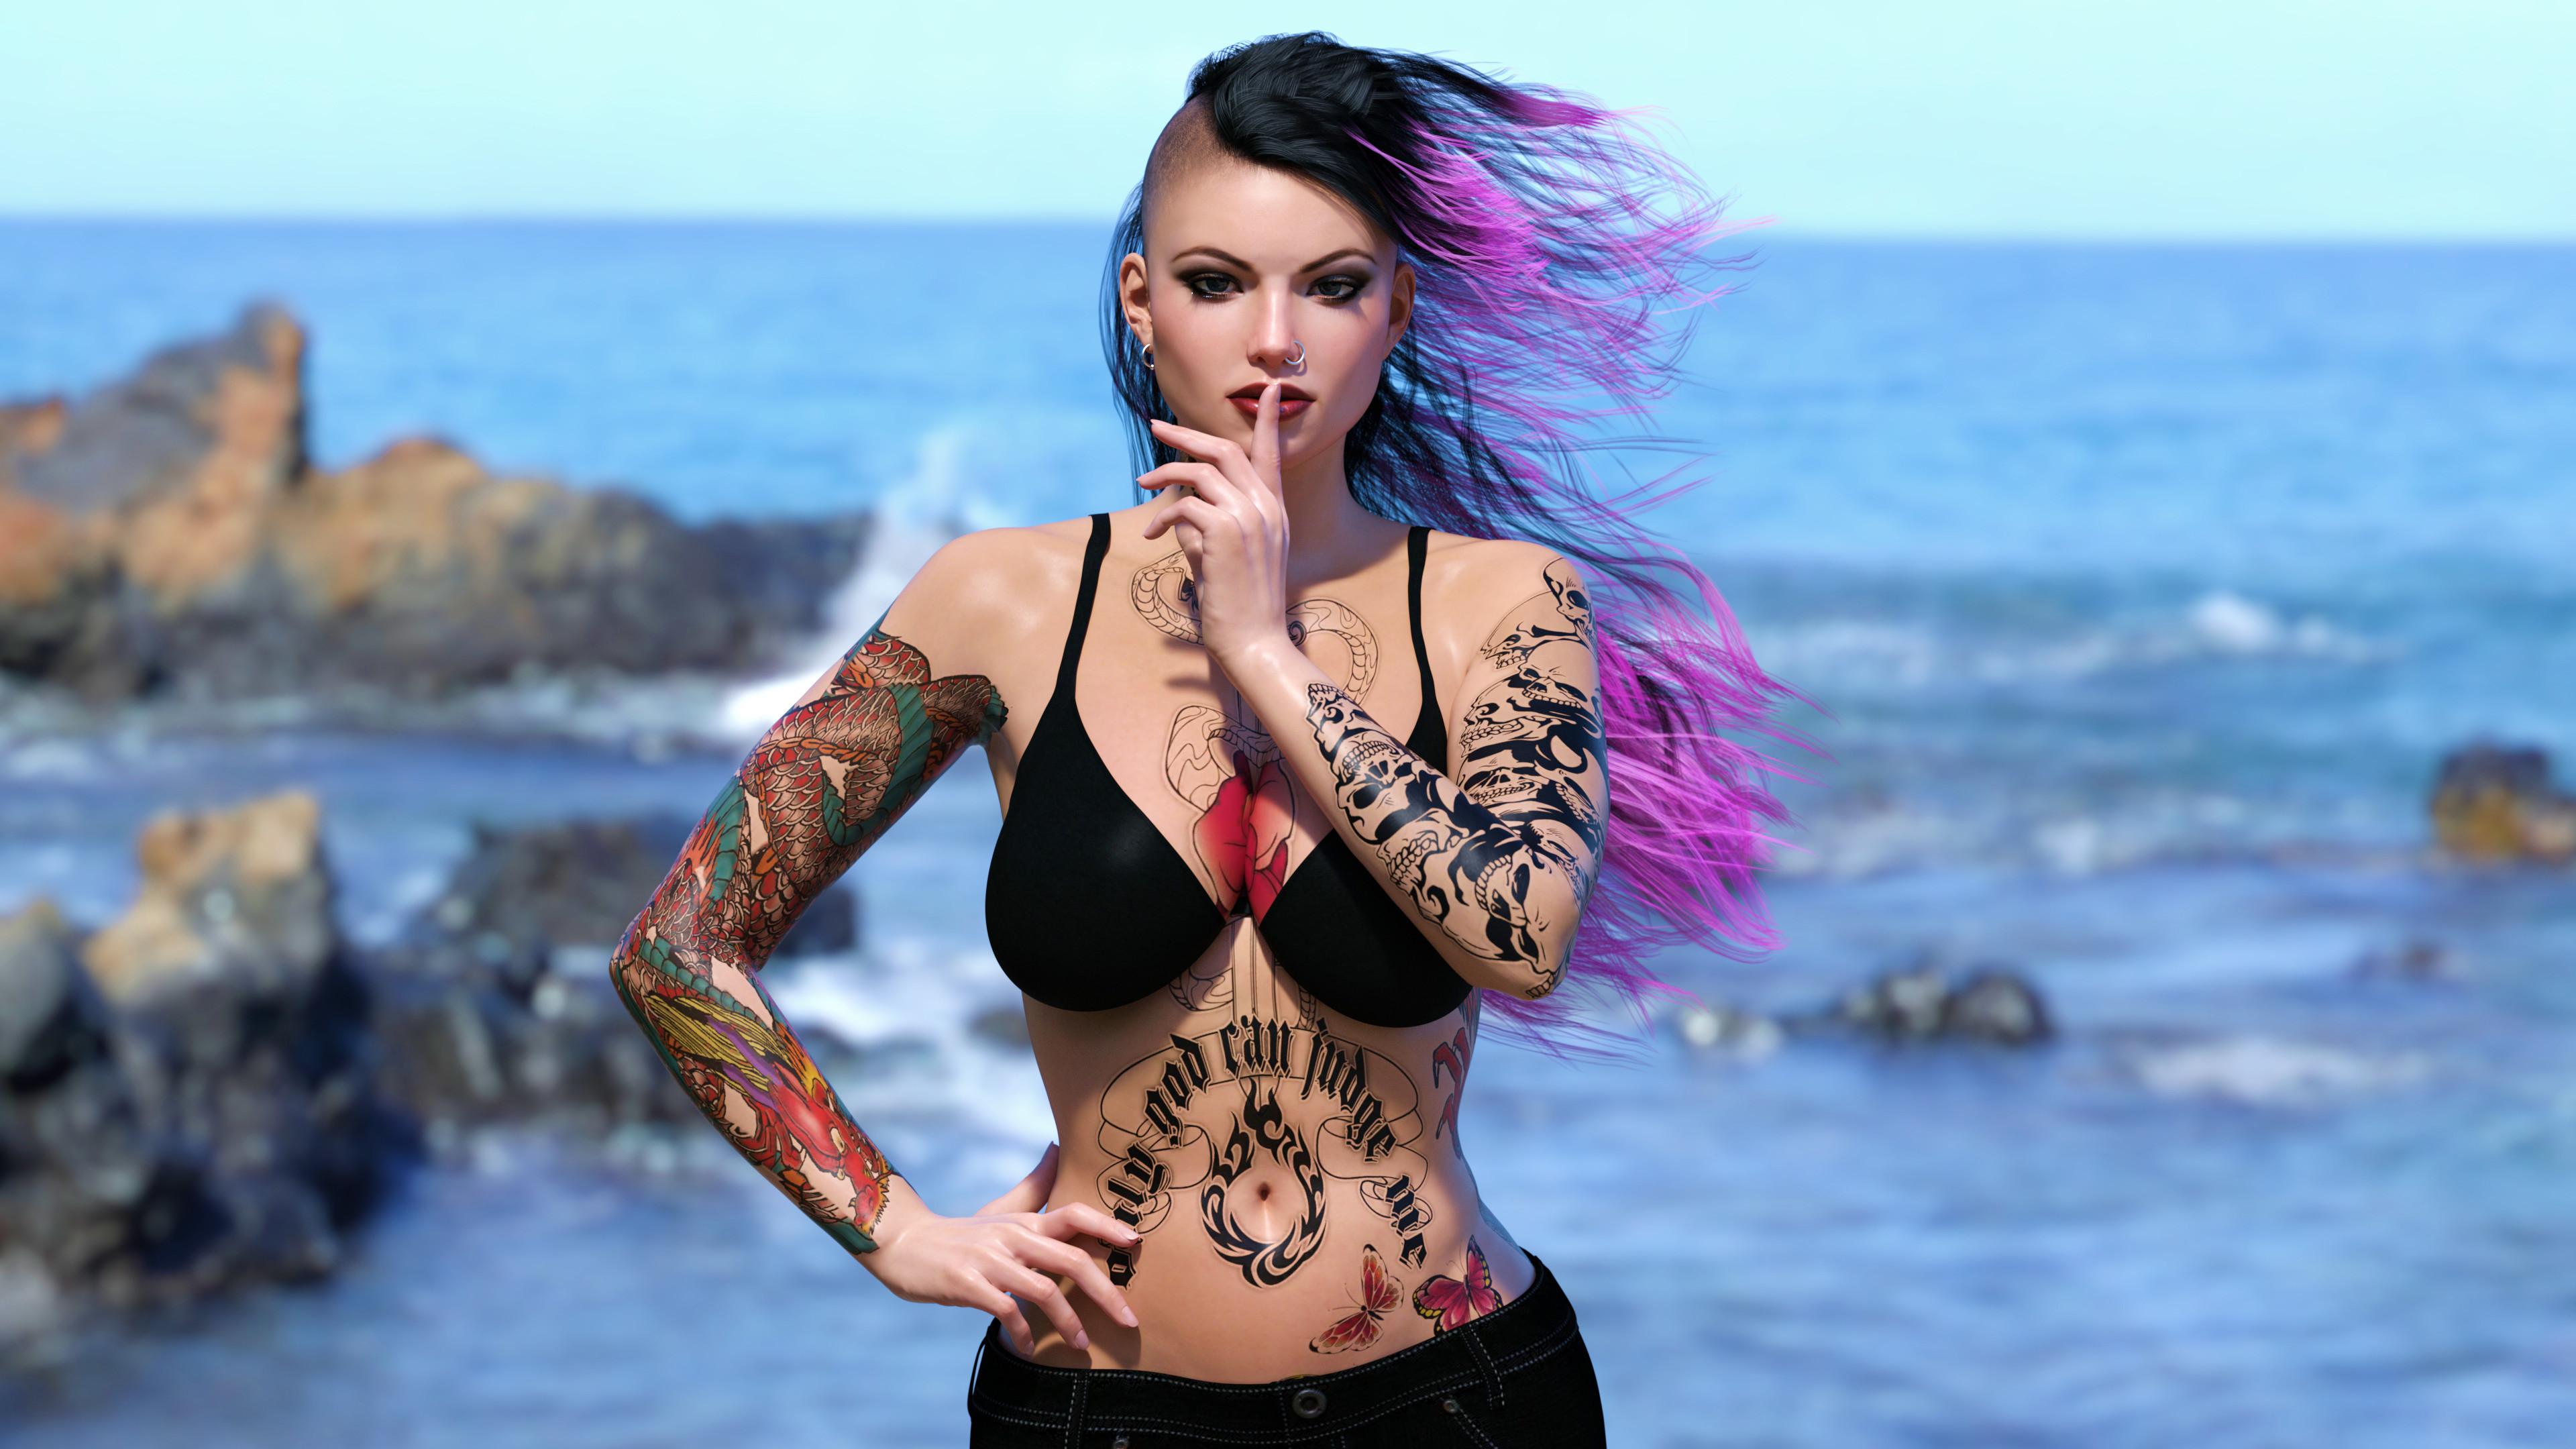 Punk Girl Beach 2 by AwakeOrStillDreaming Punk Girl Beach 2 by  AwakeOrStillDreaming